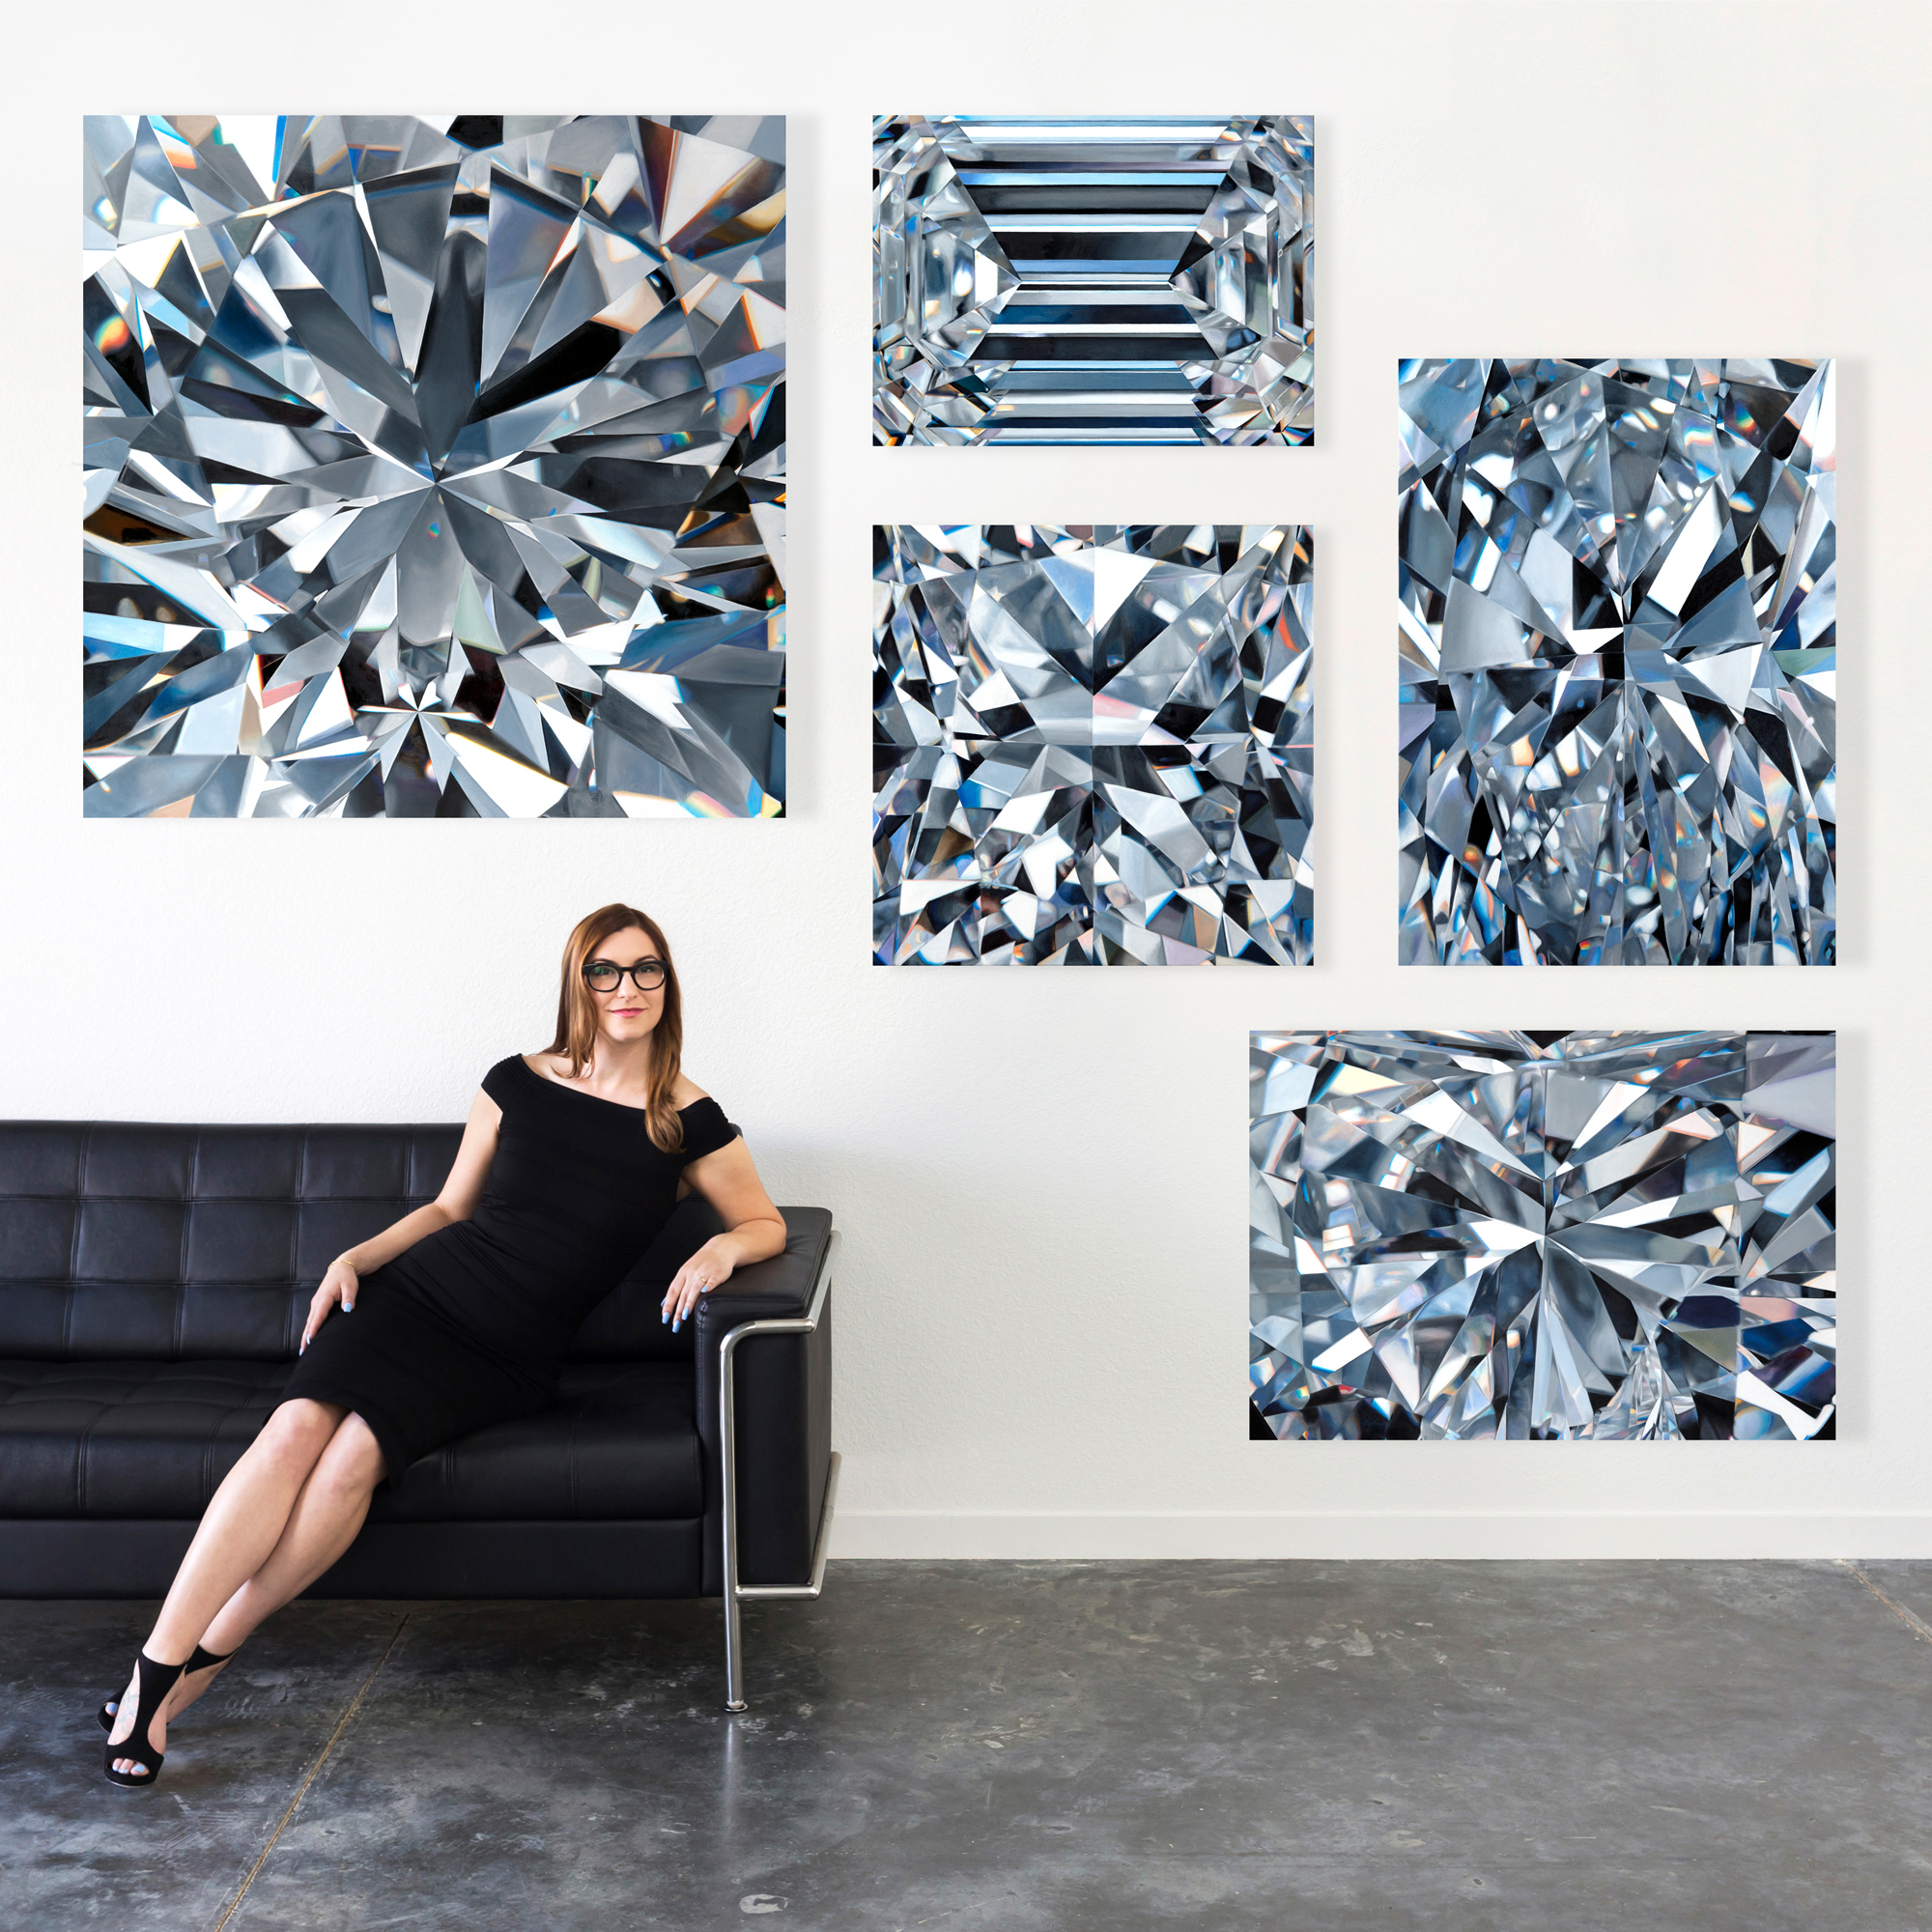 angie-crabgree-diamond-painter-artist-portrait-lilouette-1.jpg